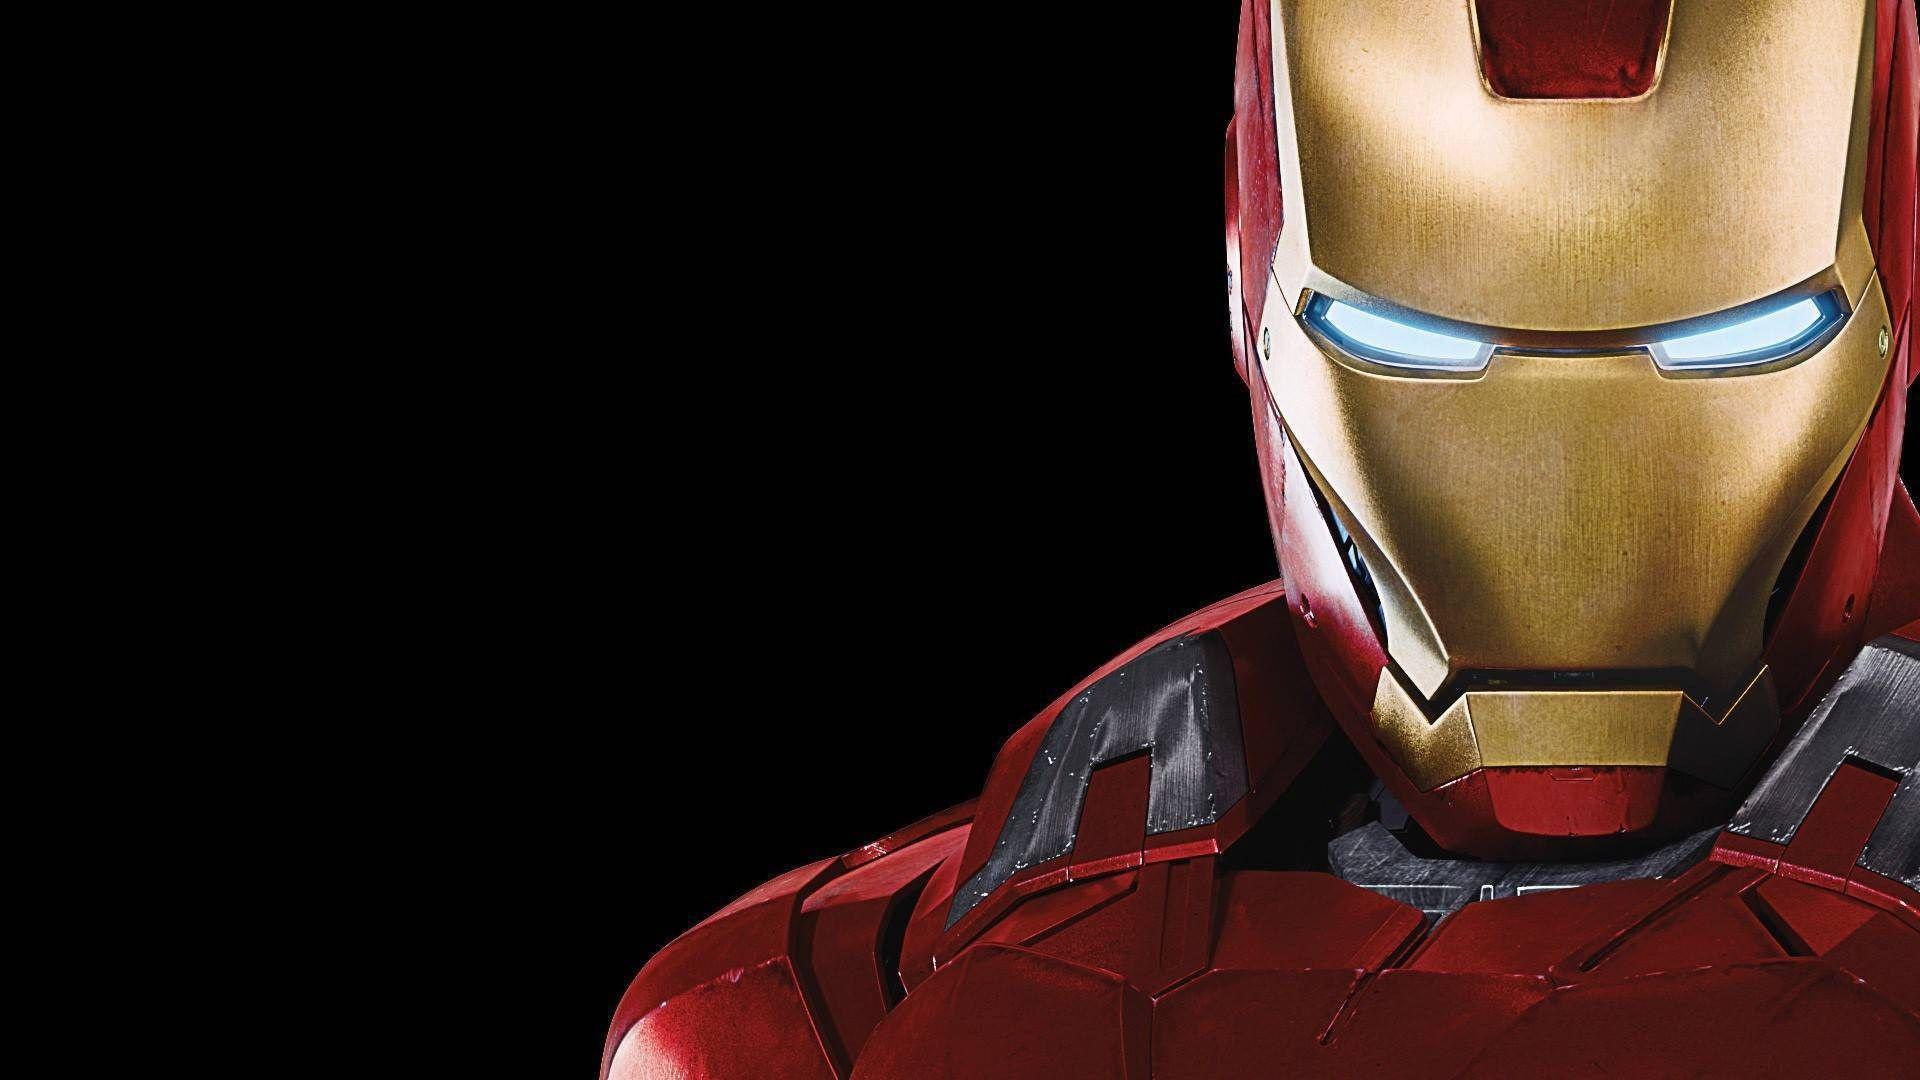 1920x1080 Iron Man Screensavers And Backgrounds Free Jpg 194 Kb